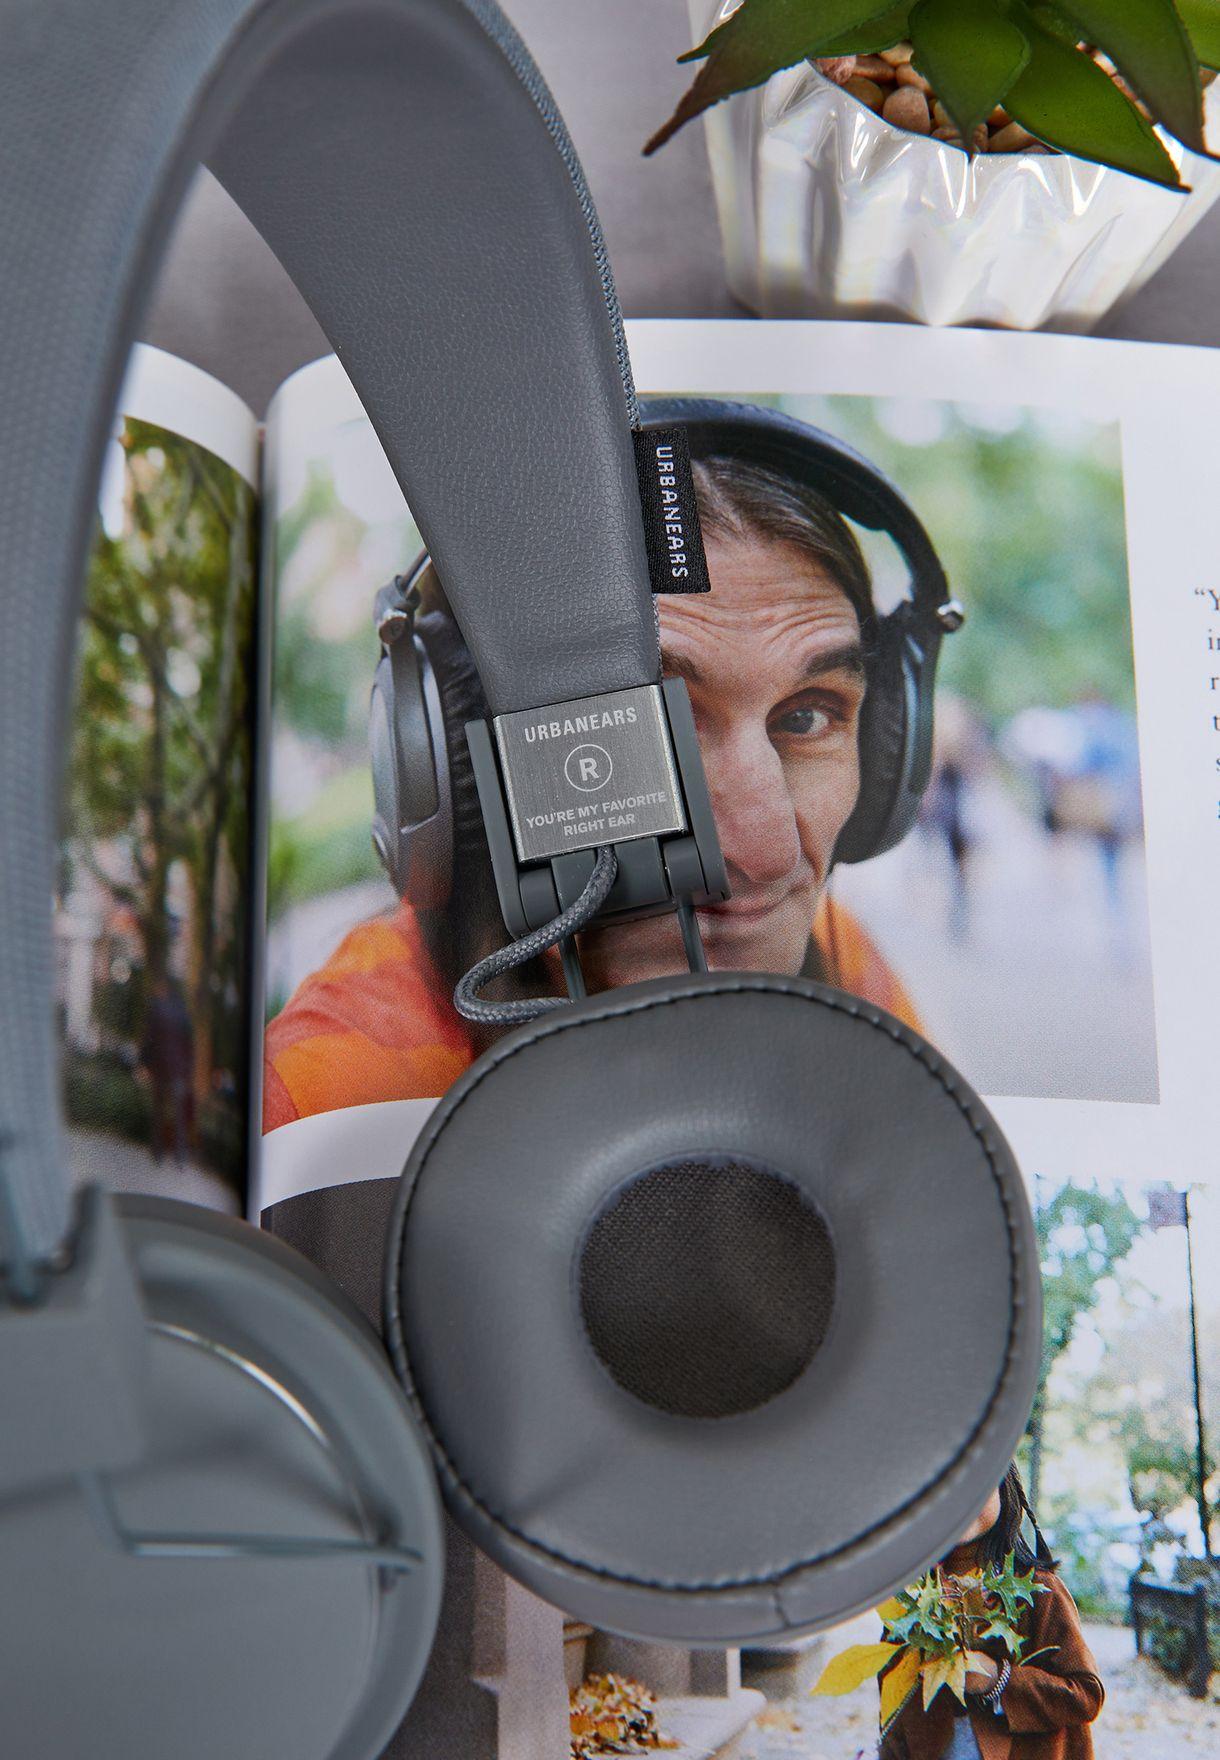 Plattan II On Ear Headphone